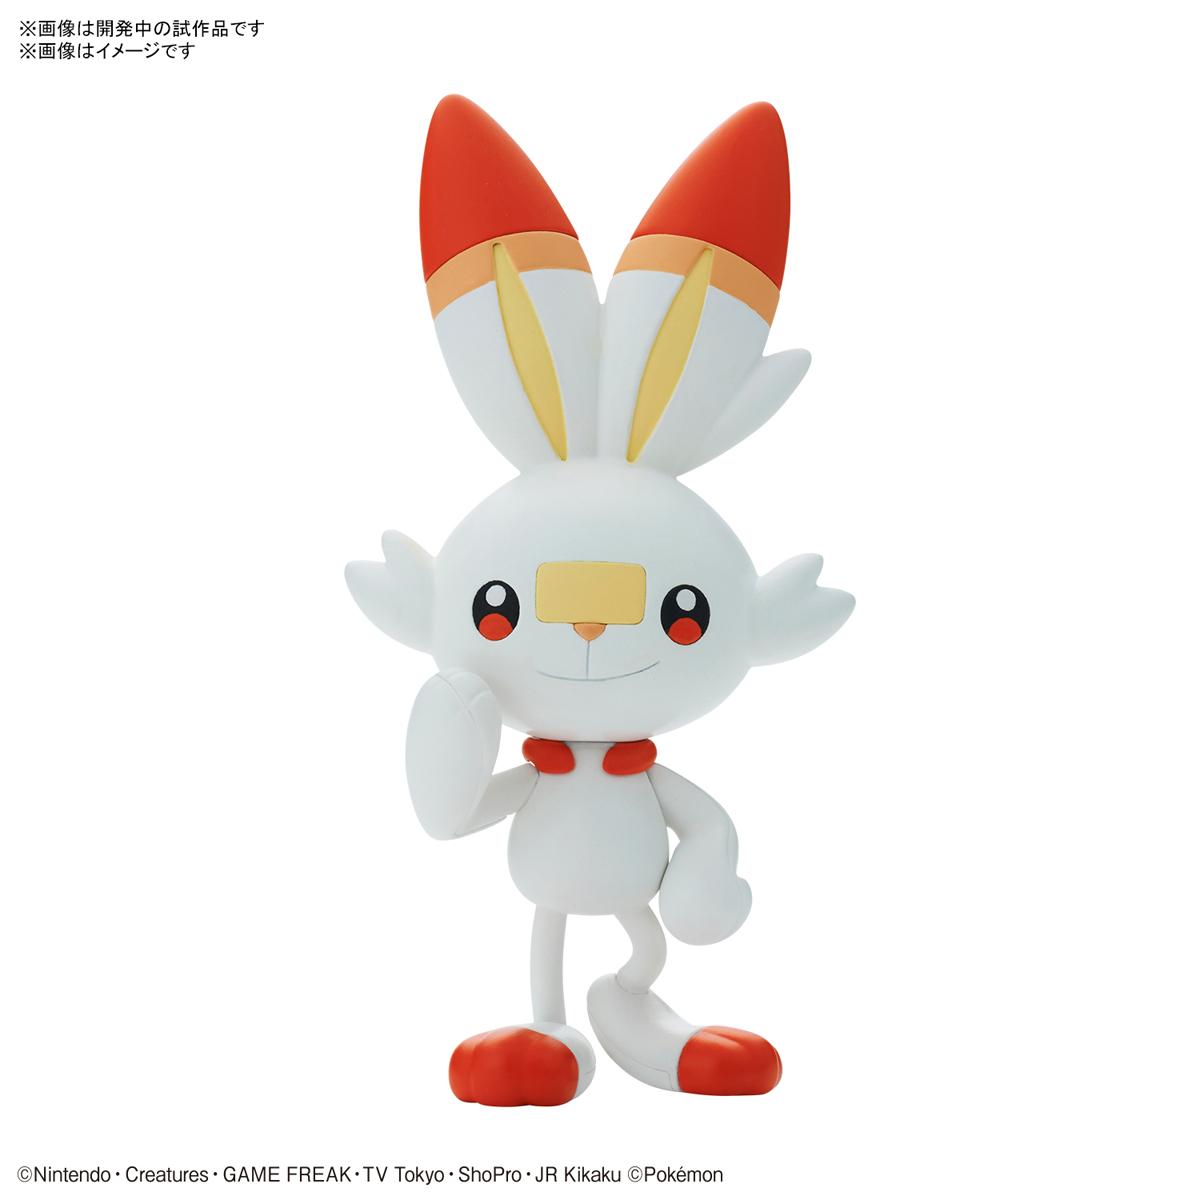 Pokémon PLAMO 收藏集 快組版!! 05 炎兔兒